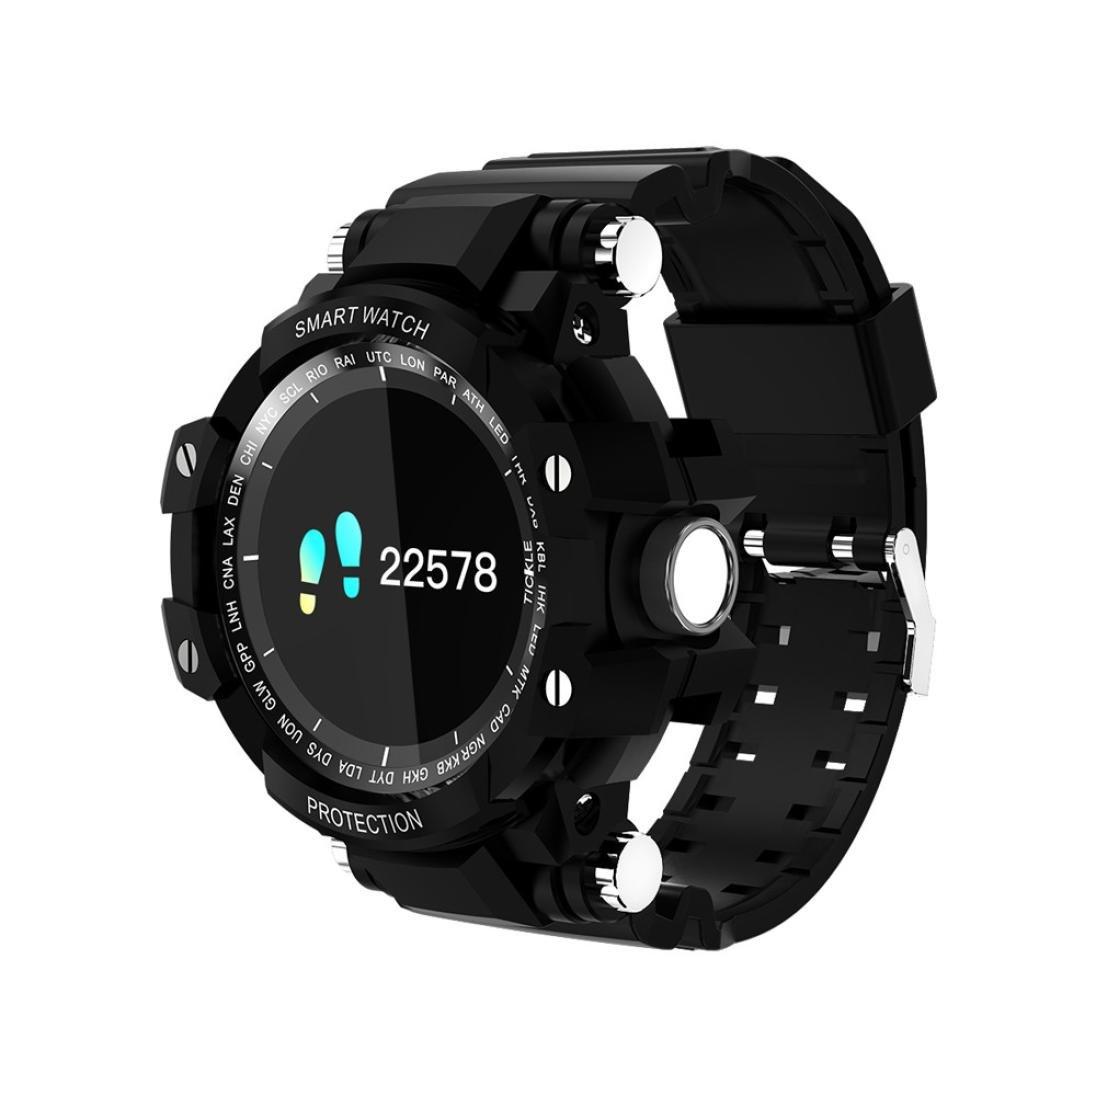 Amazon.com : Rumas GW68 Blueteeth Smart Bracelet for Men ...